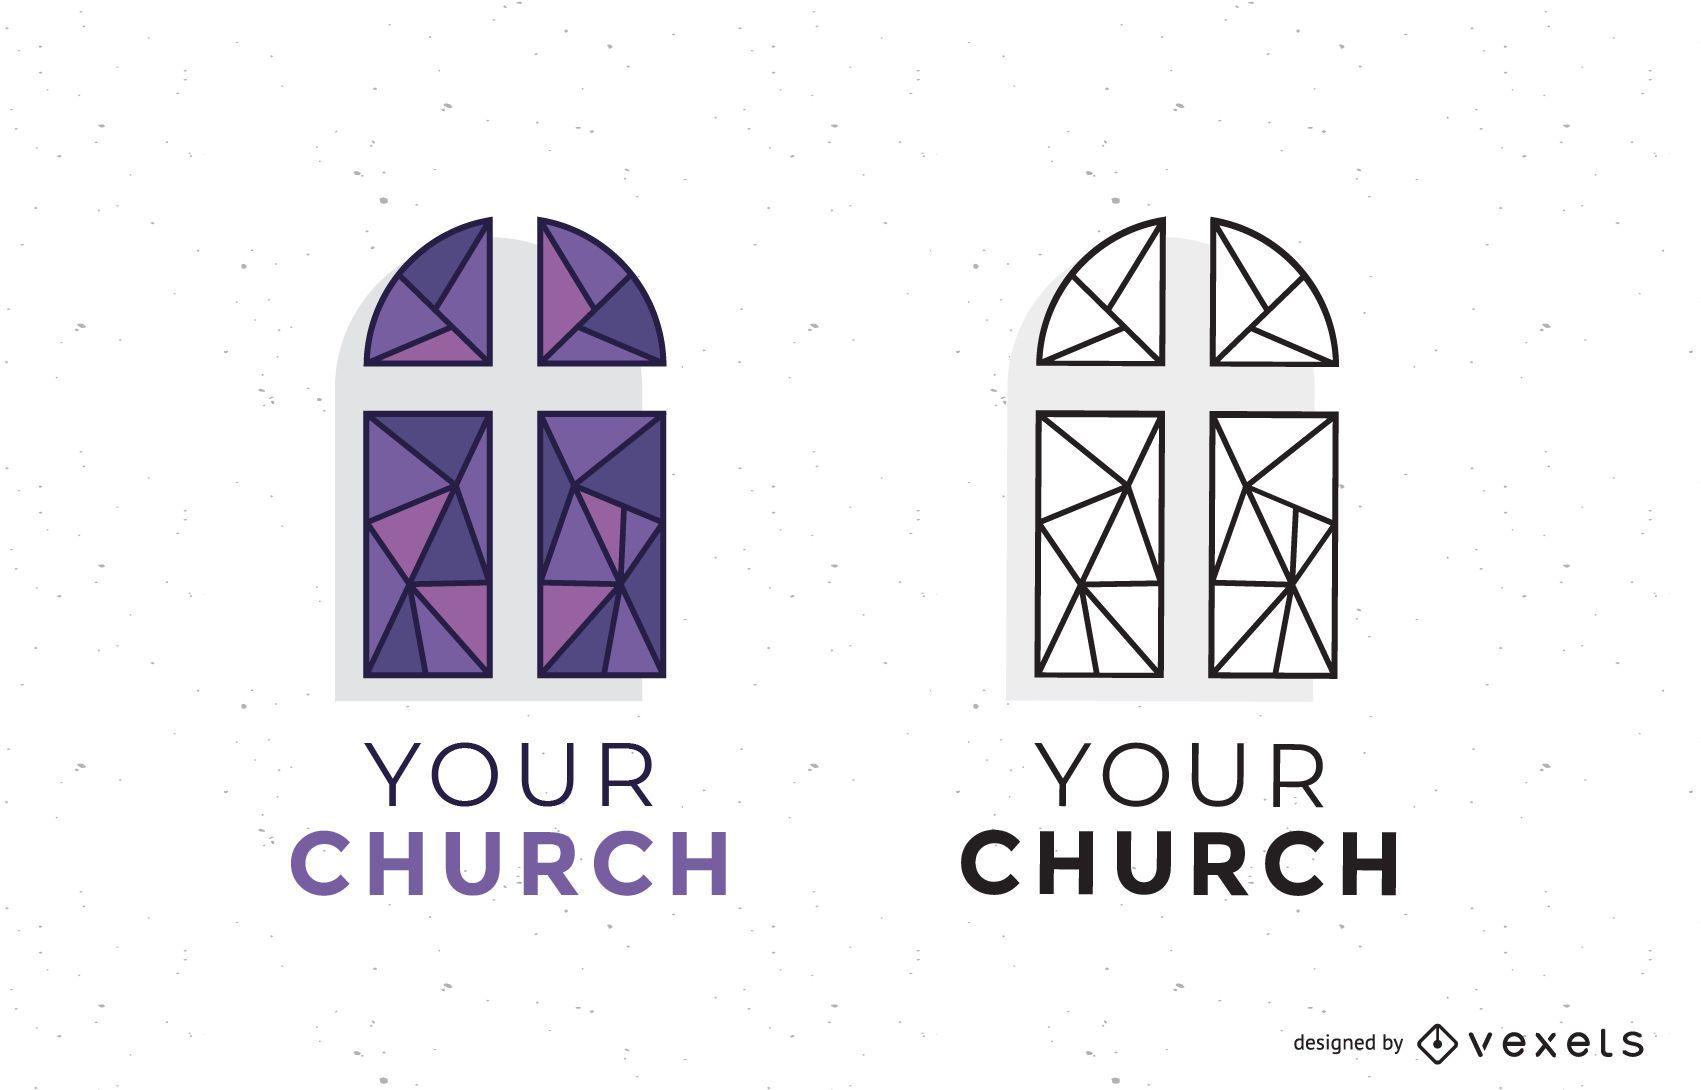 Set of Church logos